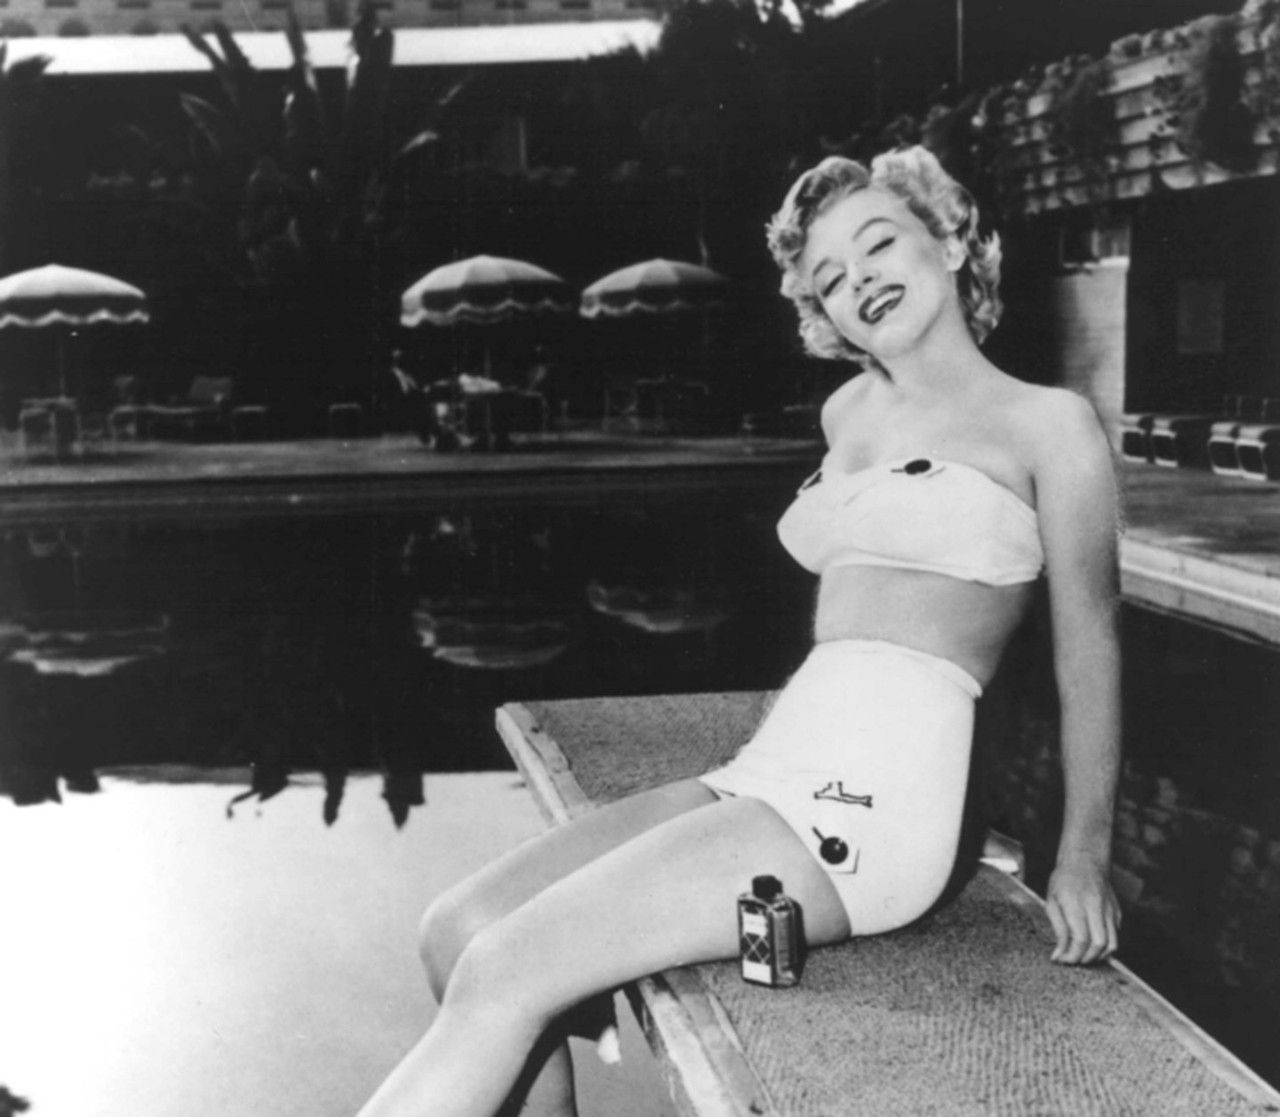 Marilyn Monroe Lounging Pool Of Hotel